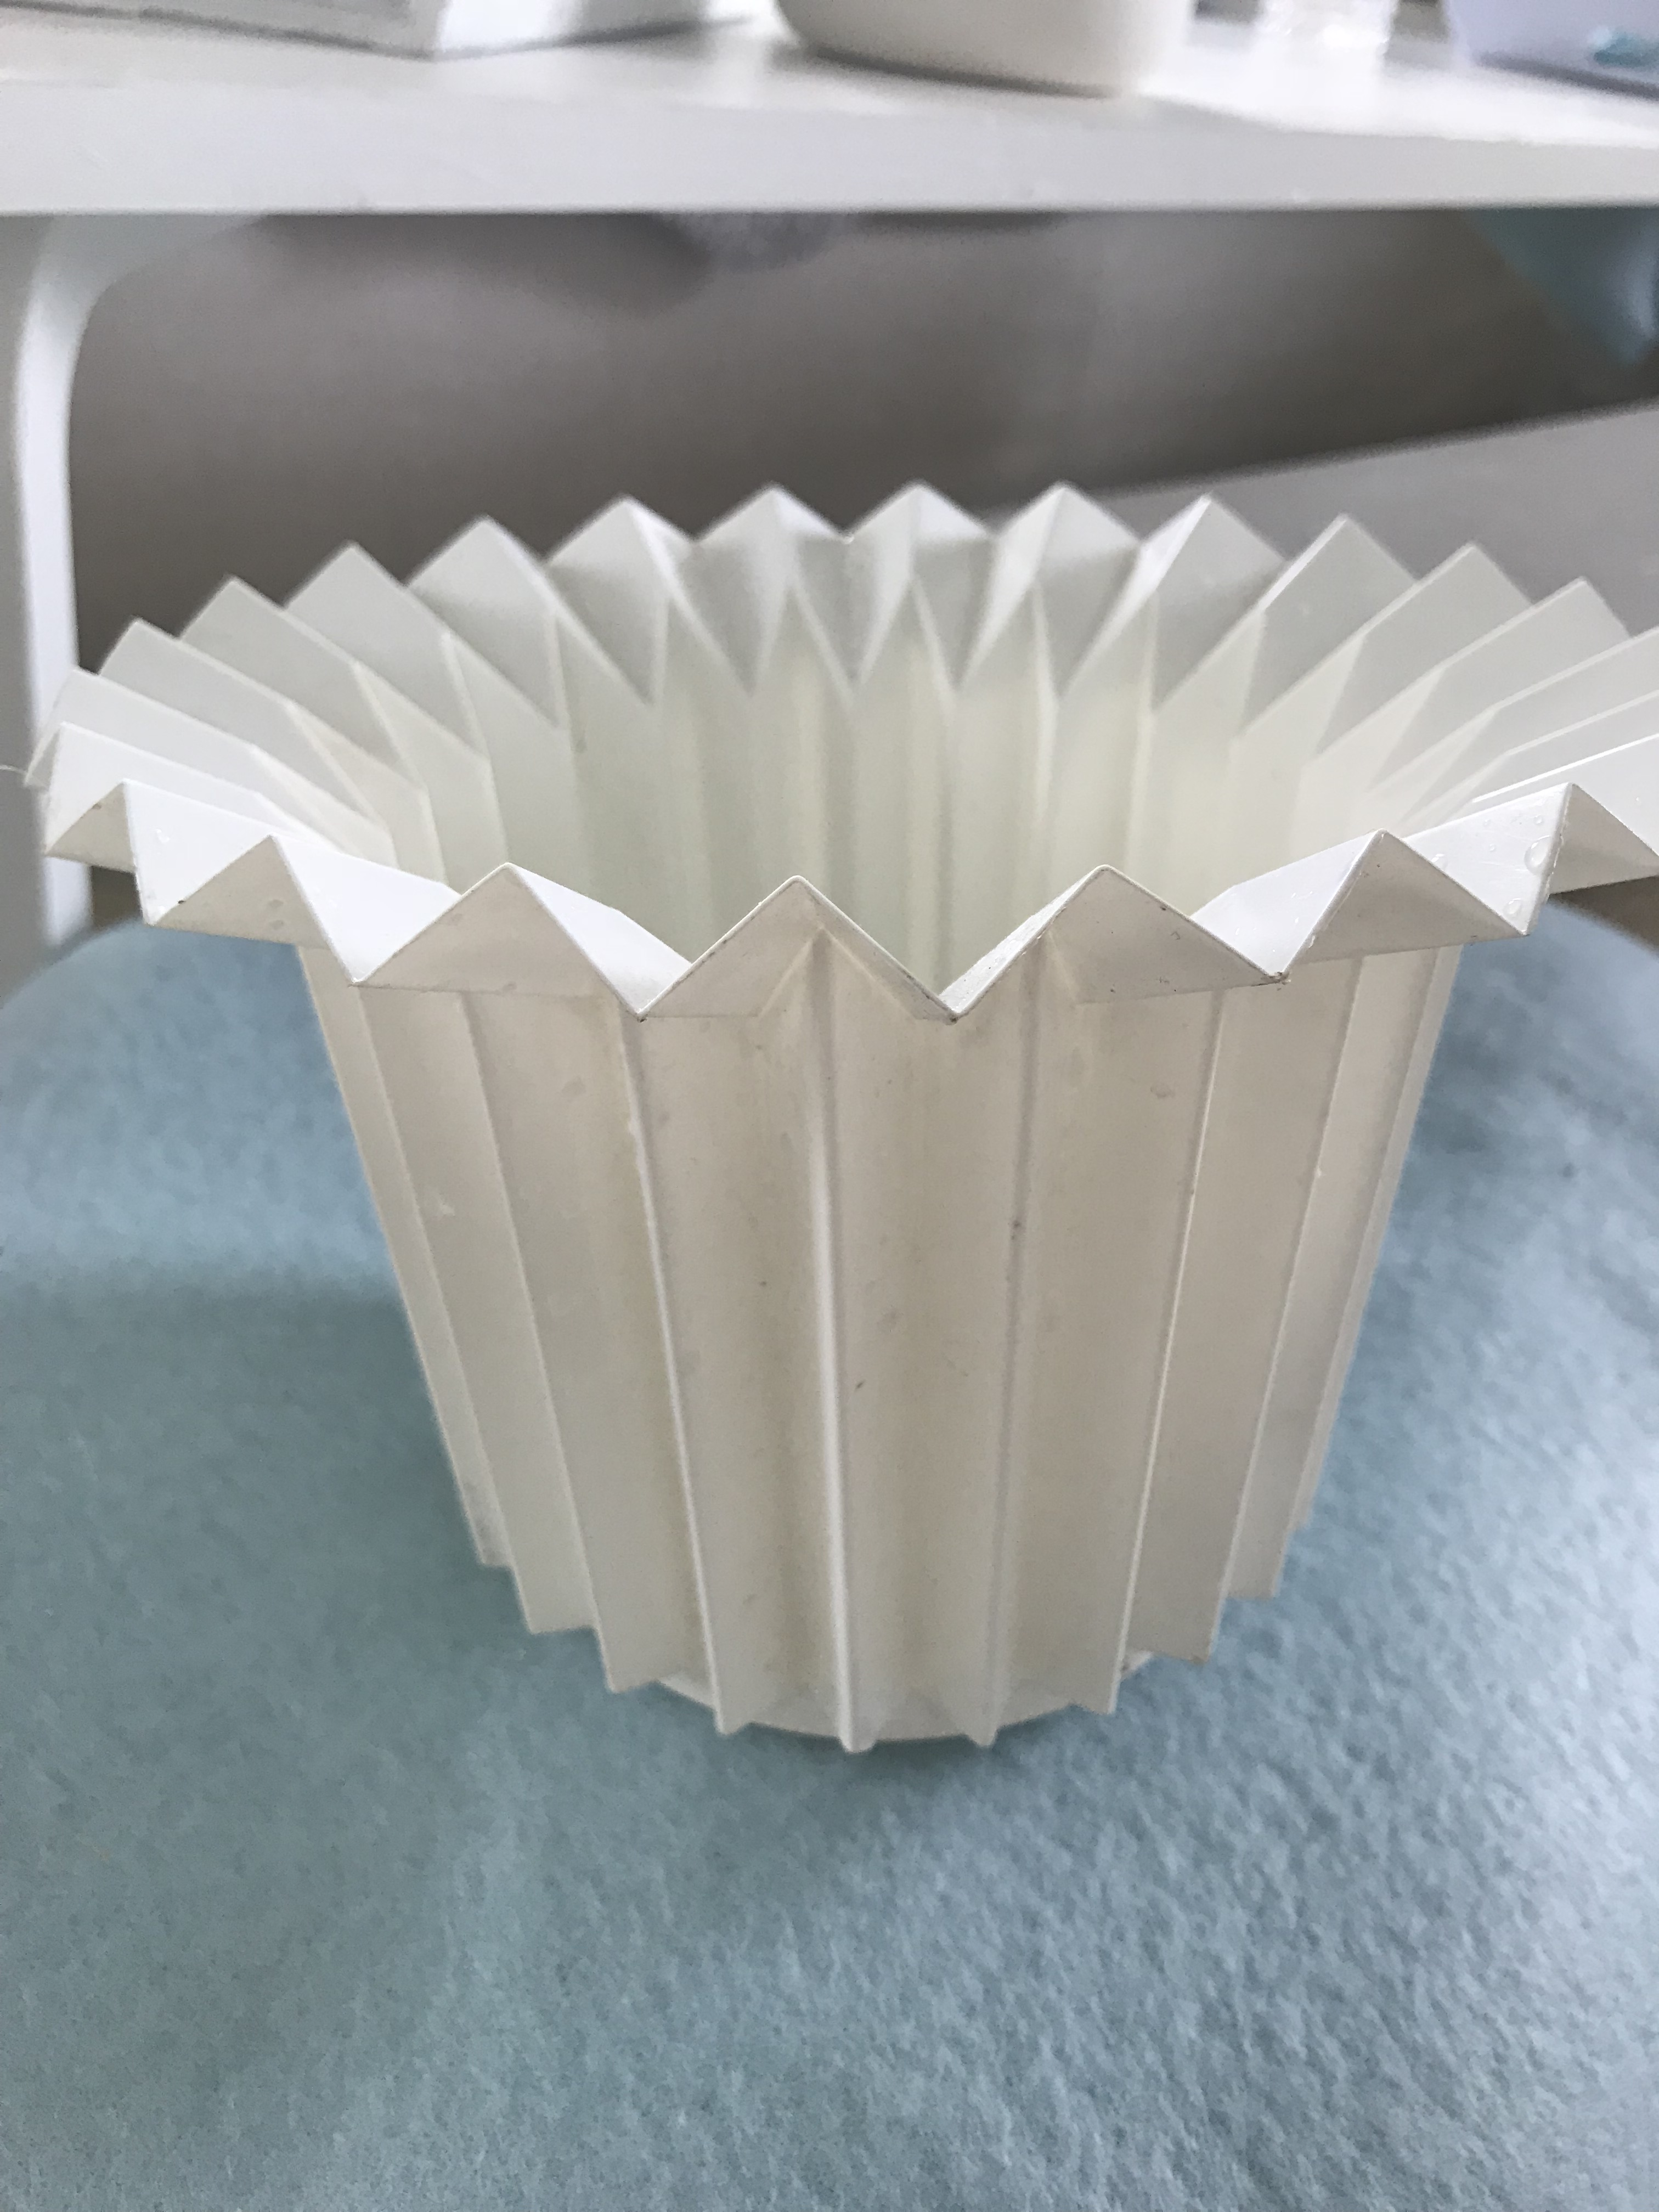 Blumentopf aus Plastik. Ausgangsmaterial für DIY Blumentopf aus Beton.